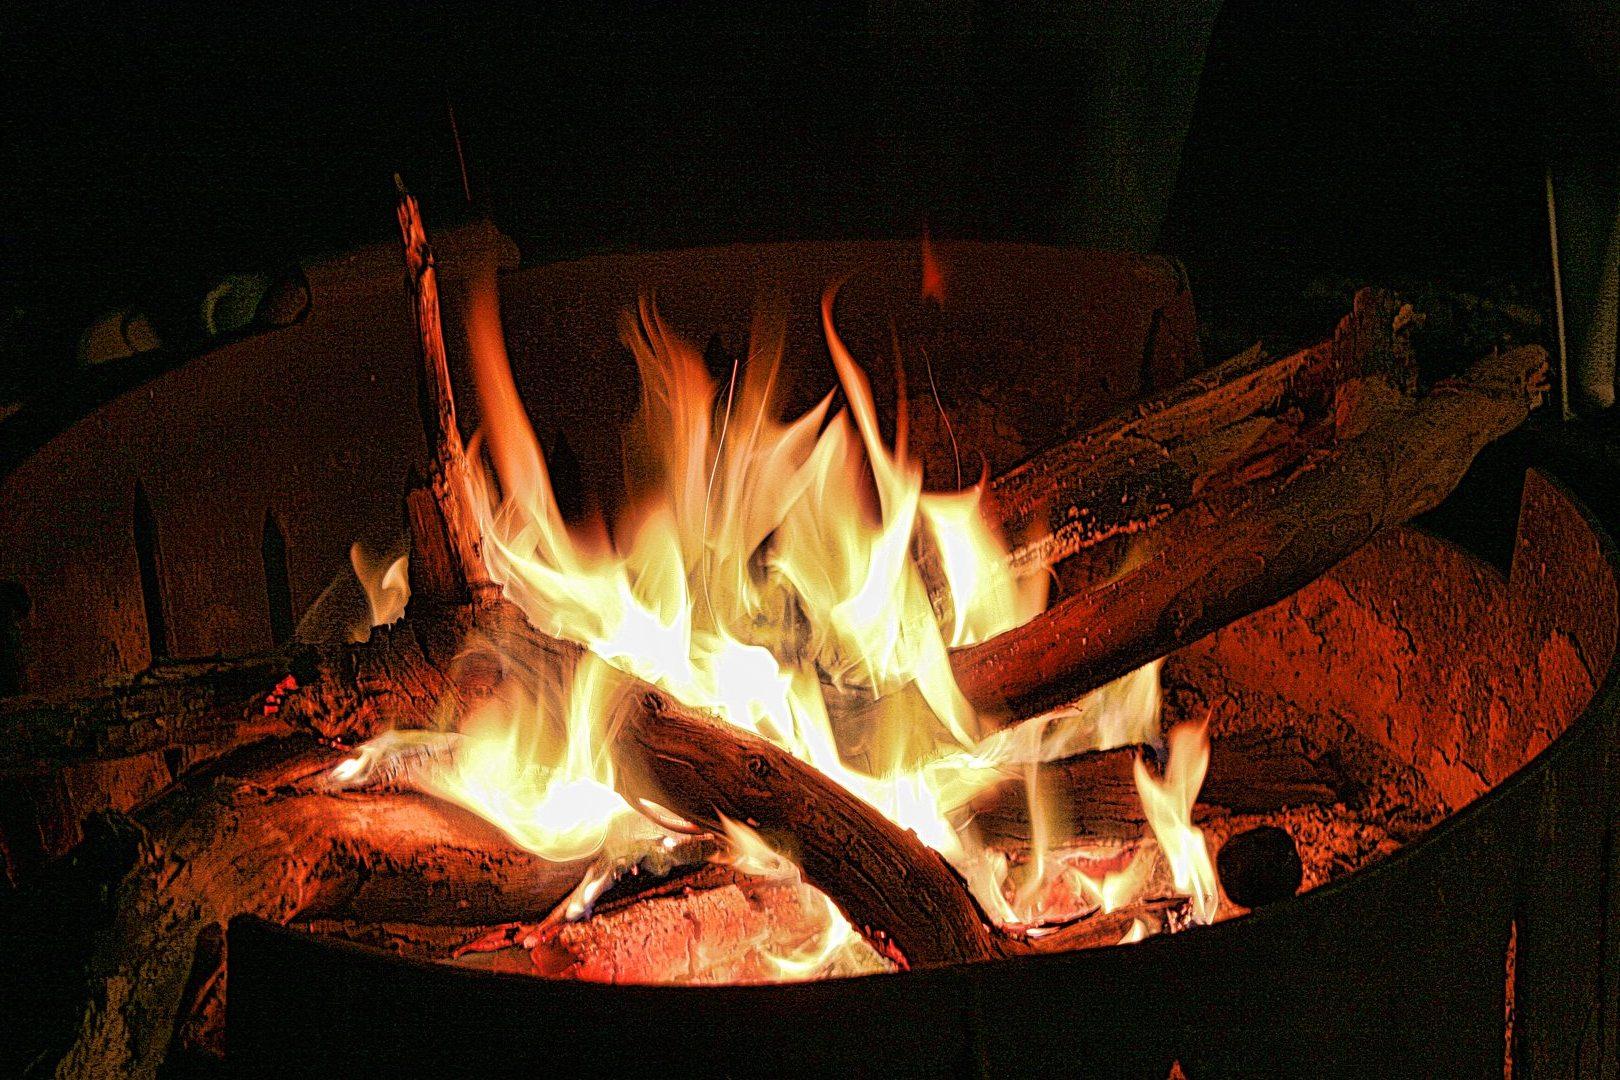 Open DPI_Campfire_Jim Fitzpatrick_Bgr HONOUR